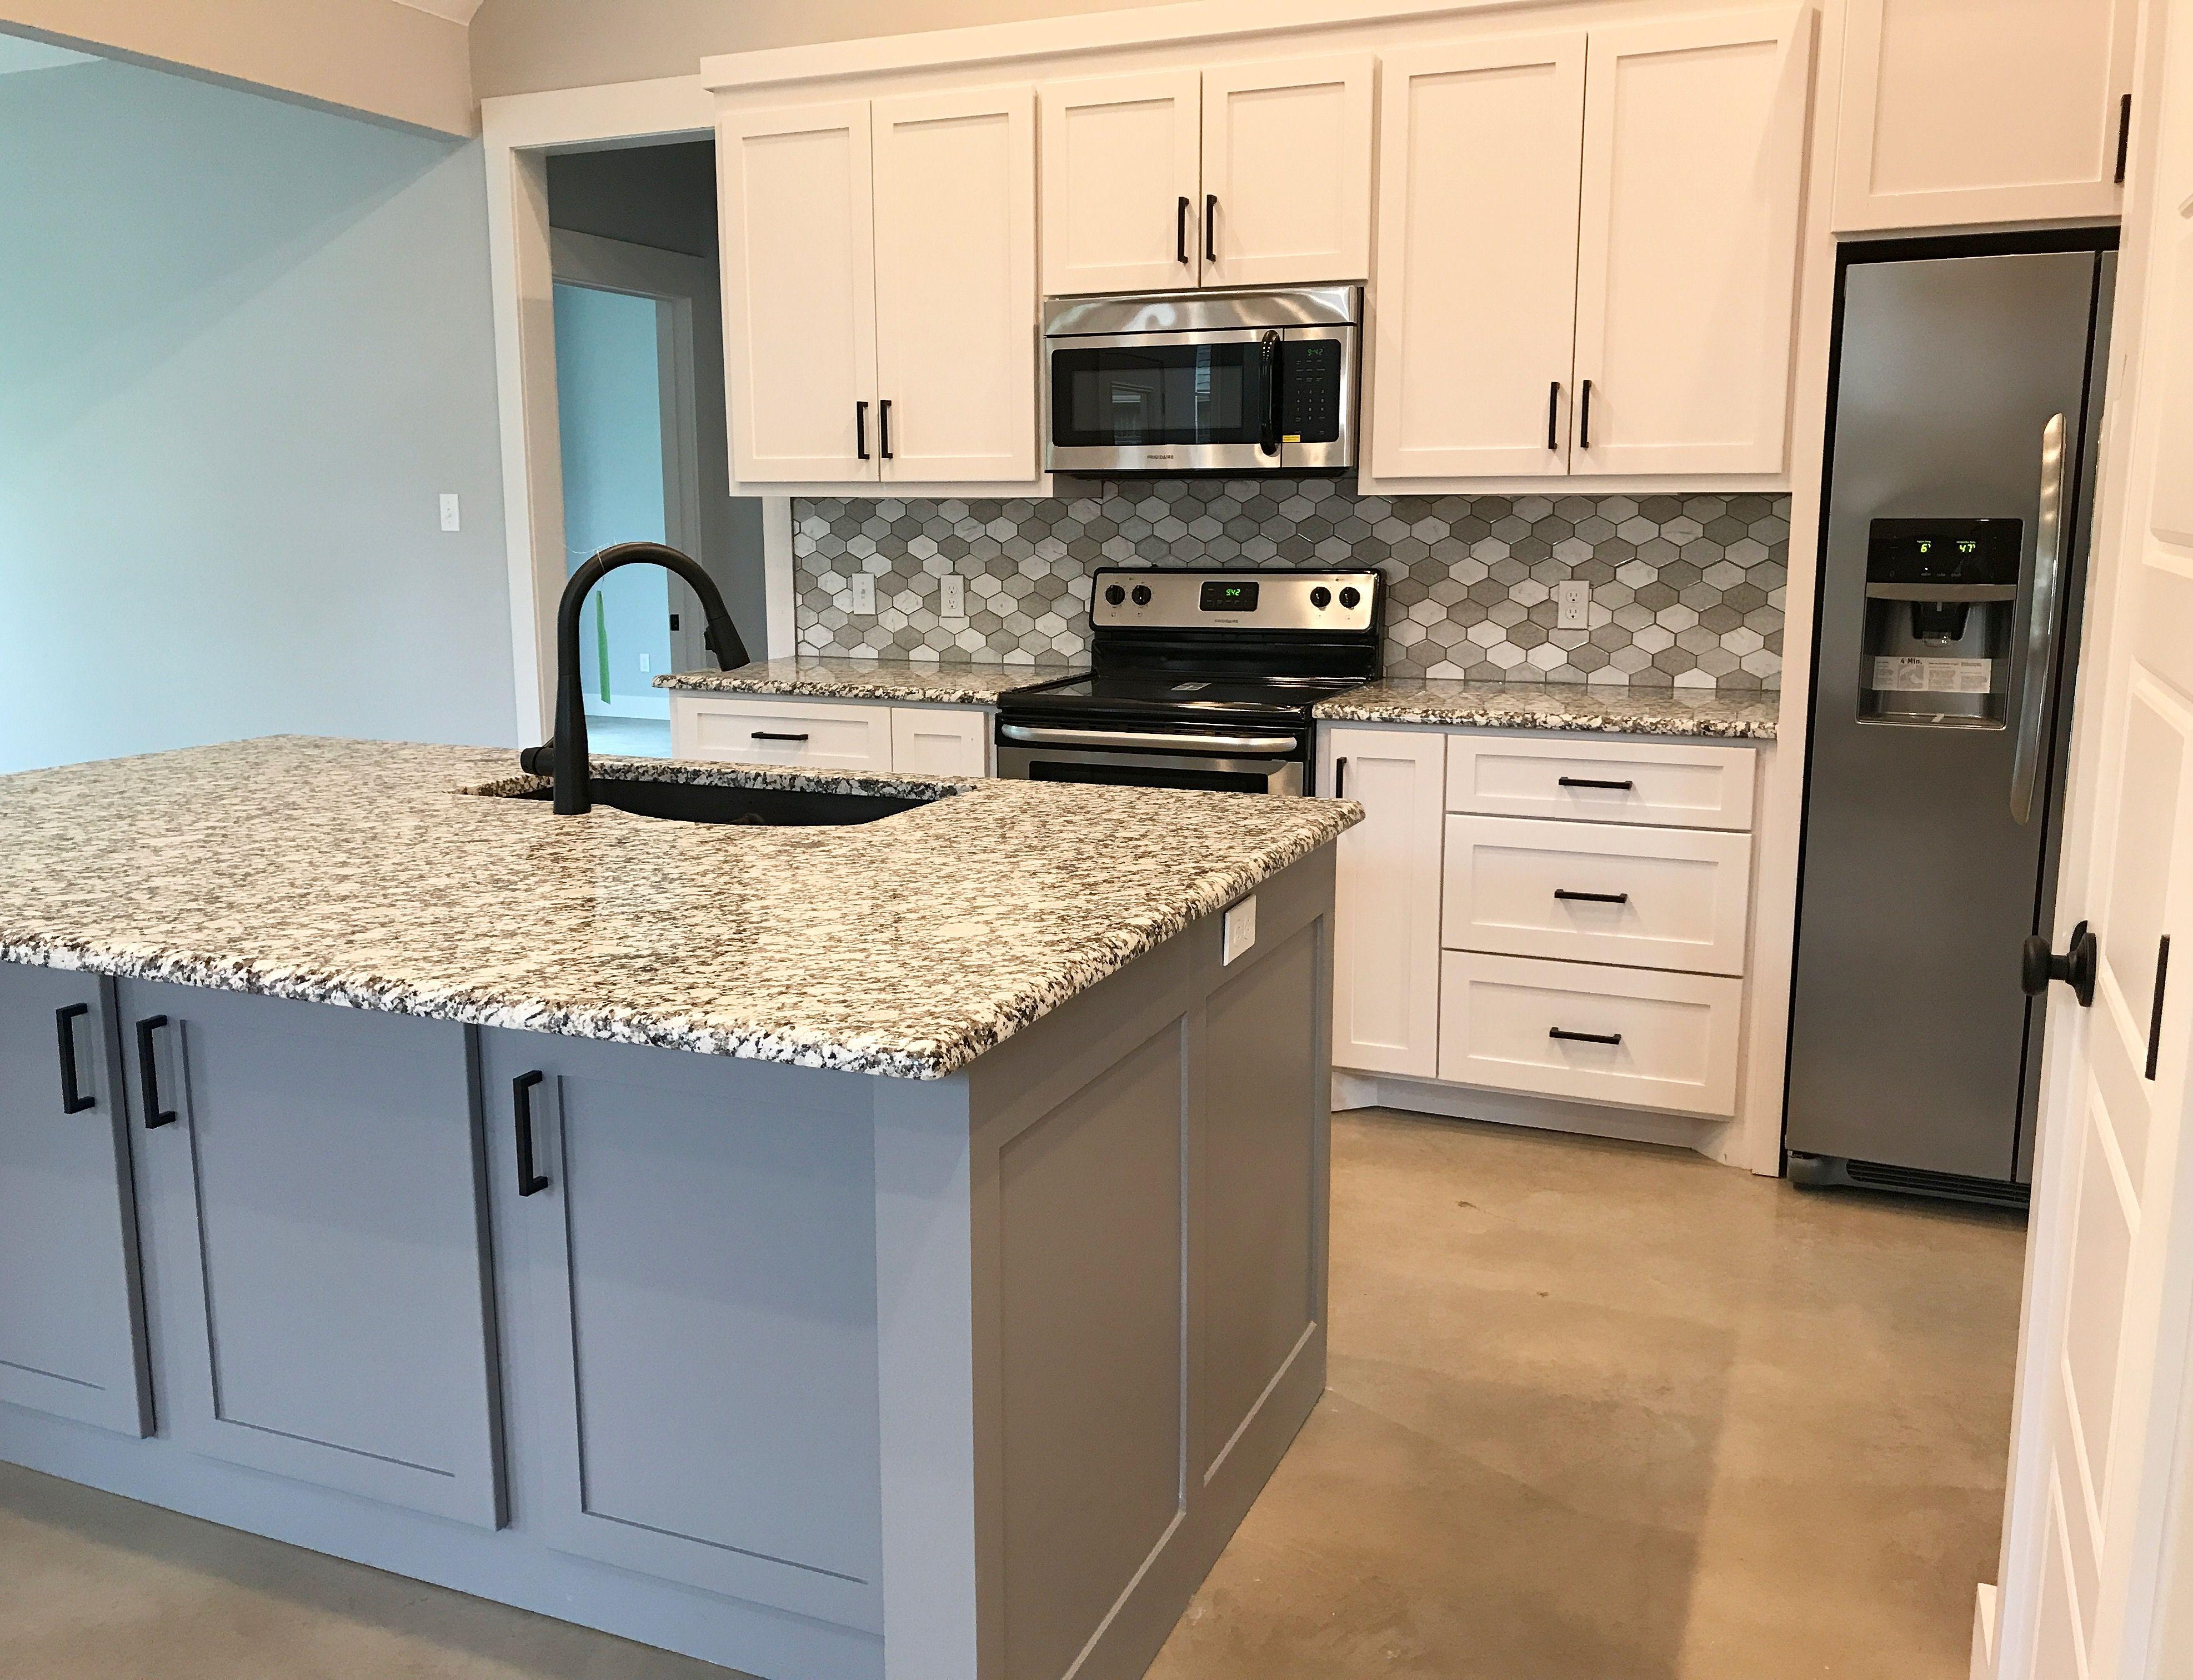 Kitchen White Shaker Cabinets Gray Shaker Island Black Square Bar Handles Granite Count Stained Kitchen Cabinets Kitchen Cabinets Trendy Kitchen Backsplash